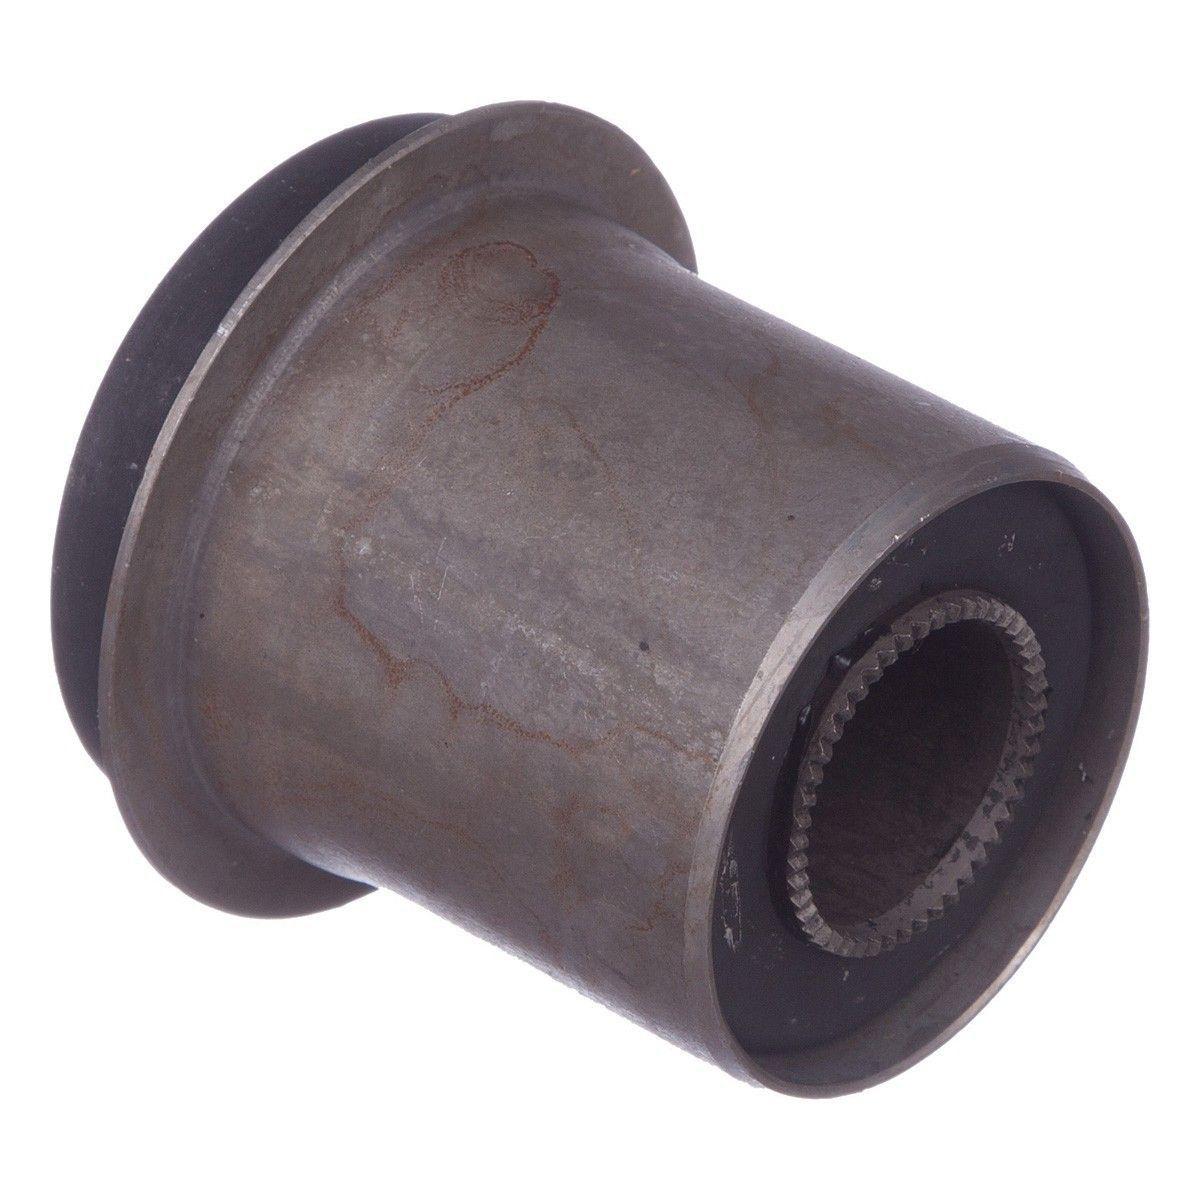 Bucha inferior bandeja dianteira - D-10 de 1985 a 1985